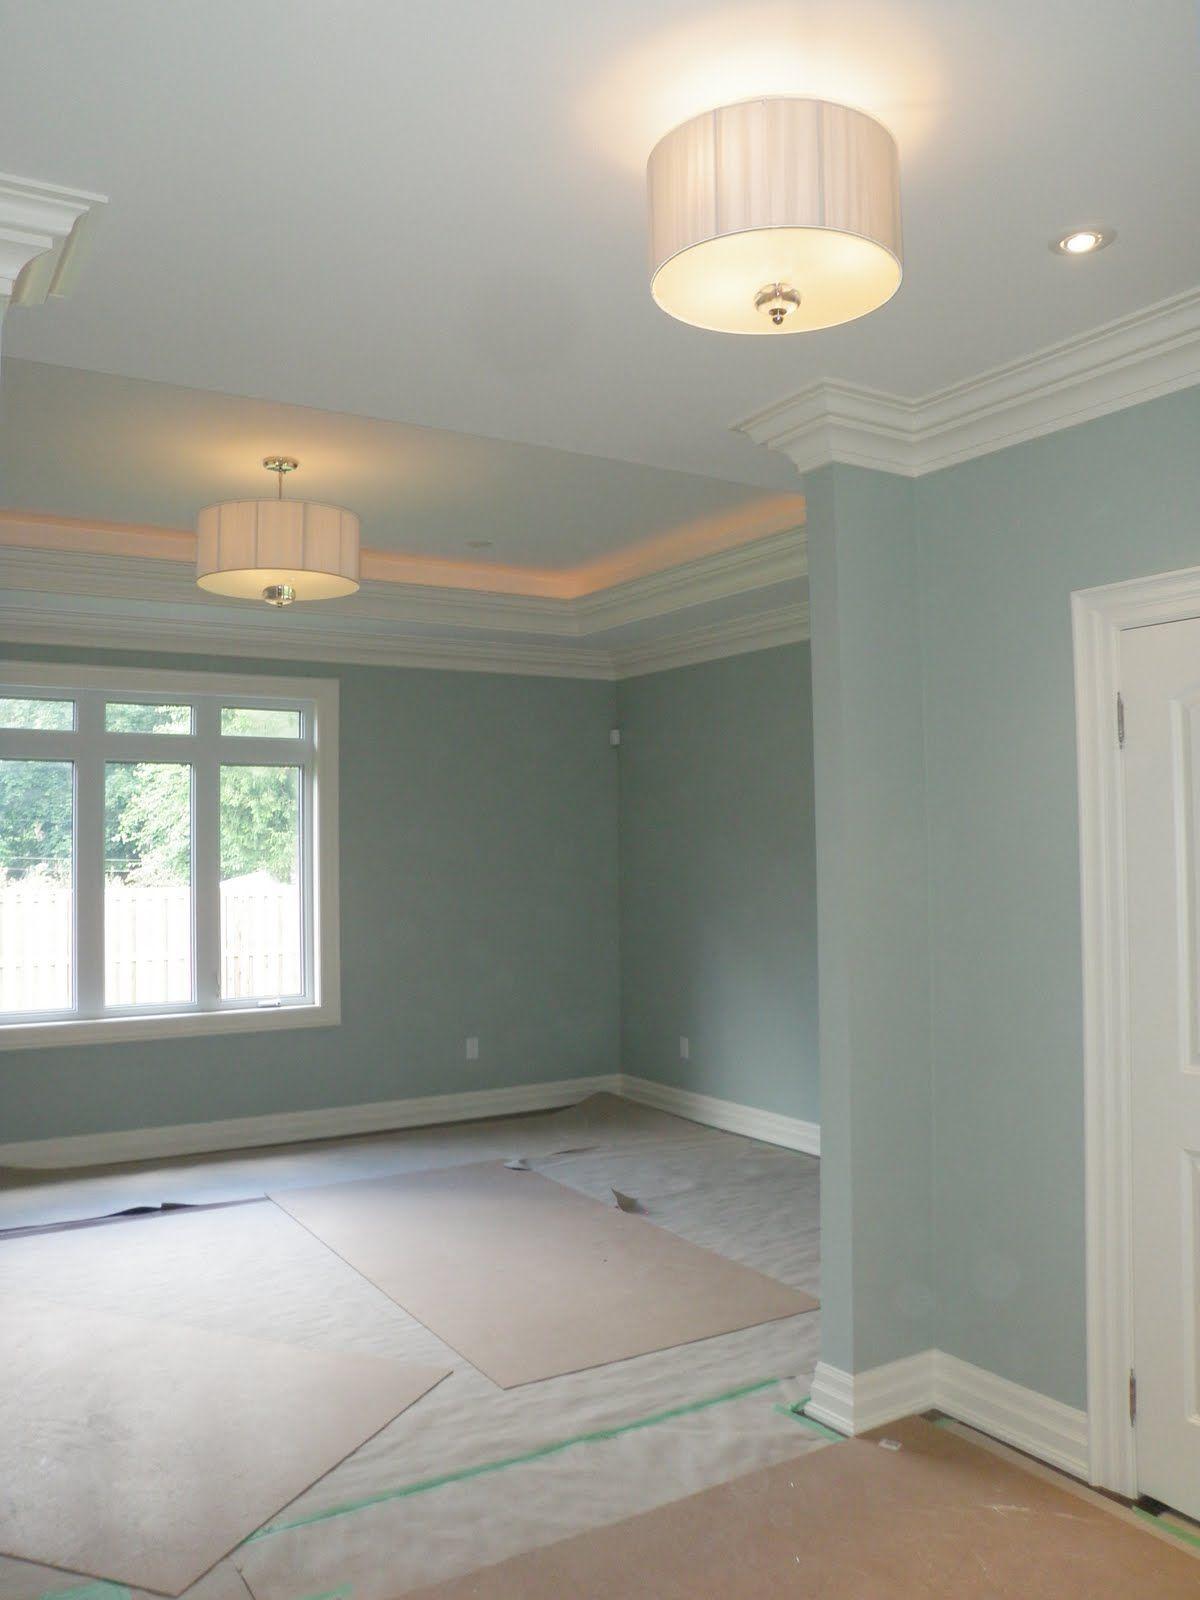 2135 50 soft chinchilla benjamin moore silver and white. Black Bedroom Furniture Sets. Home Design Ideas